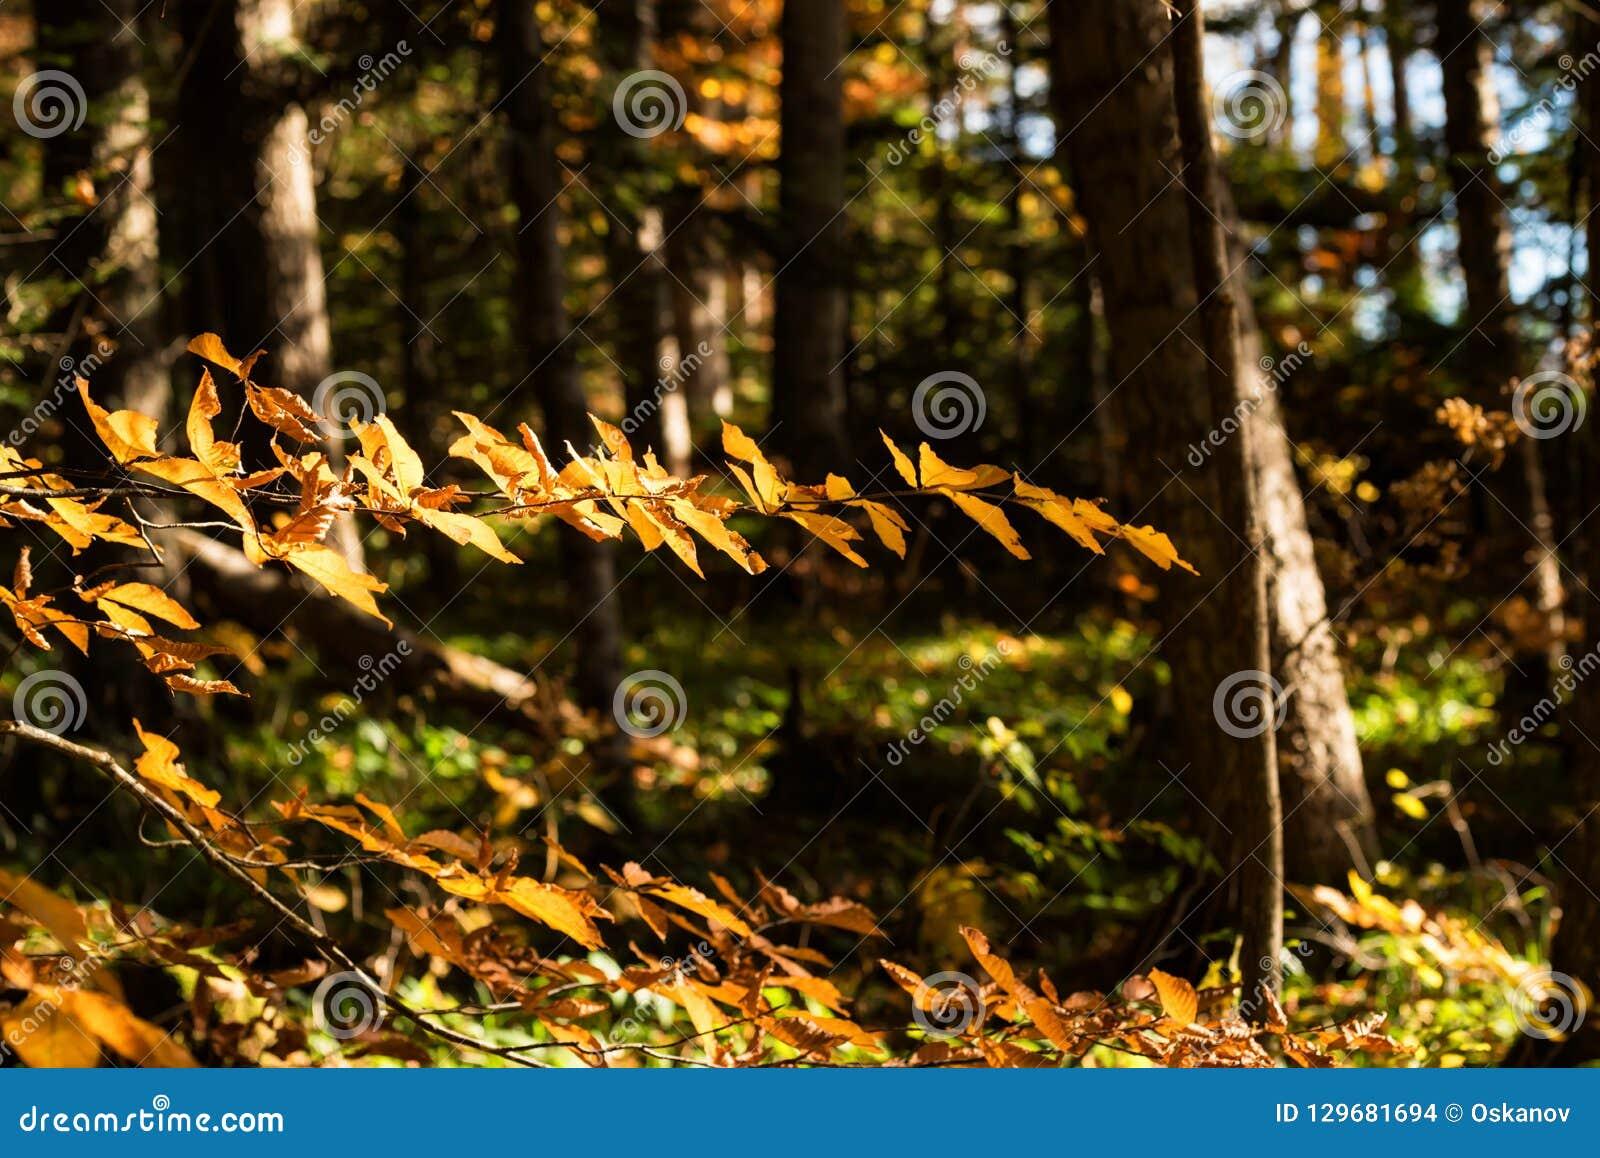 Scenic landscape of beautiful sunlit autumn forest